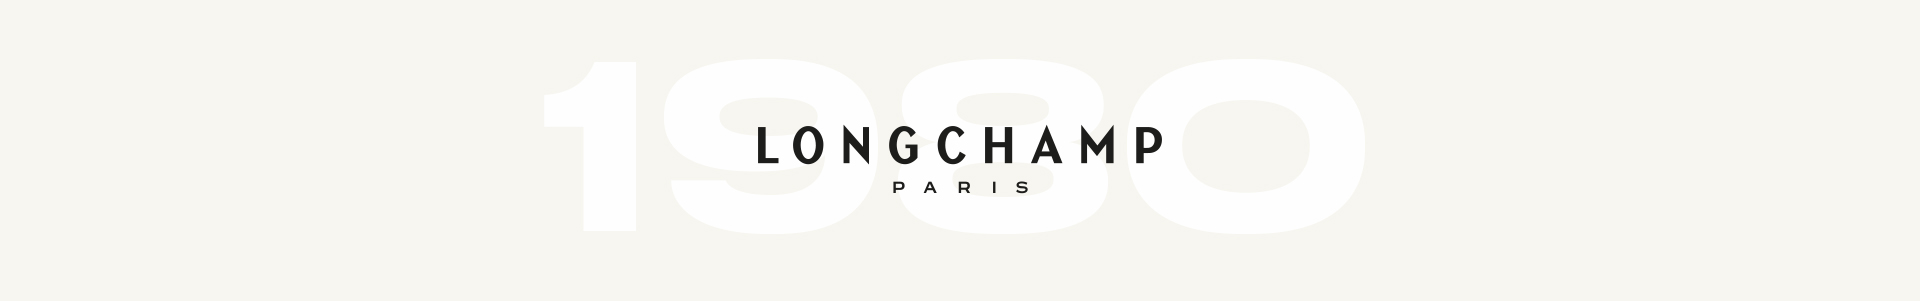 Longchamp 1980